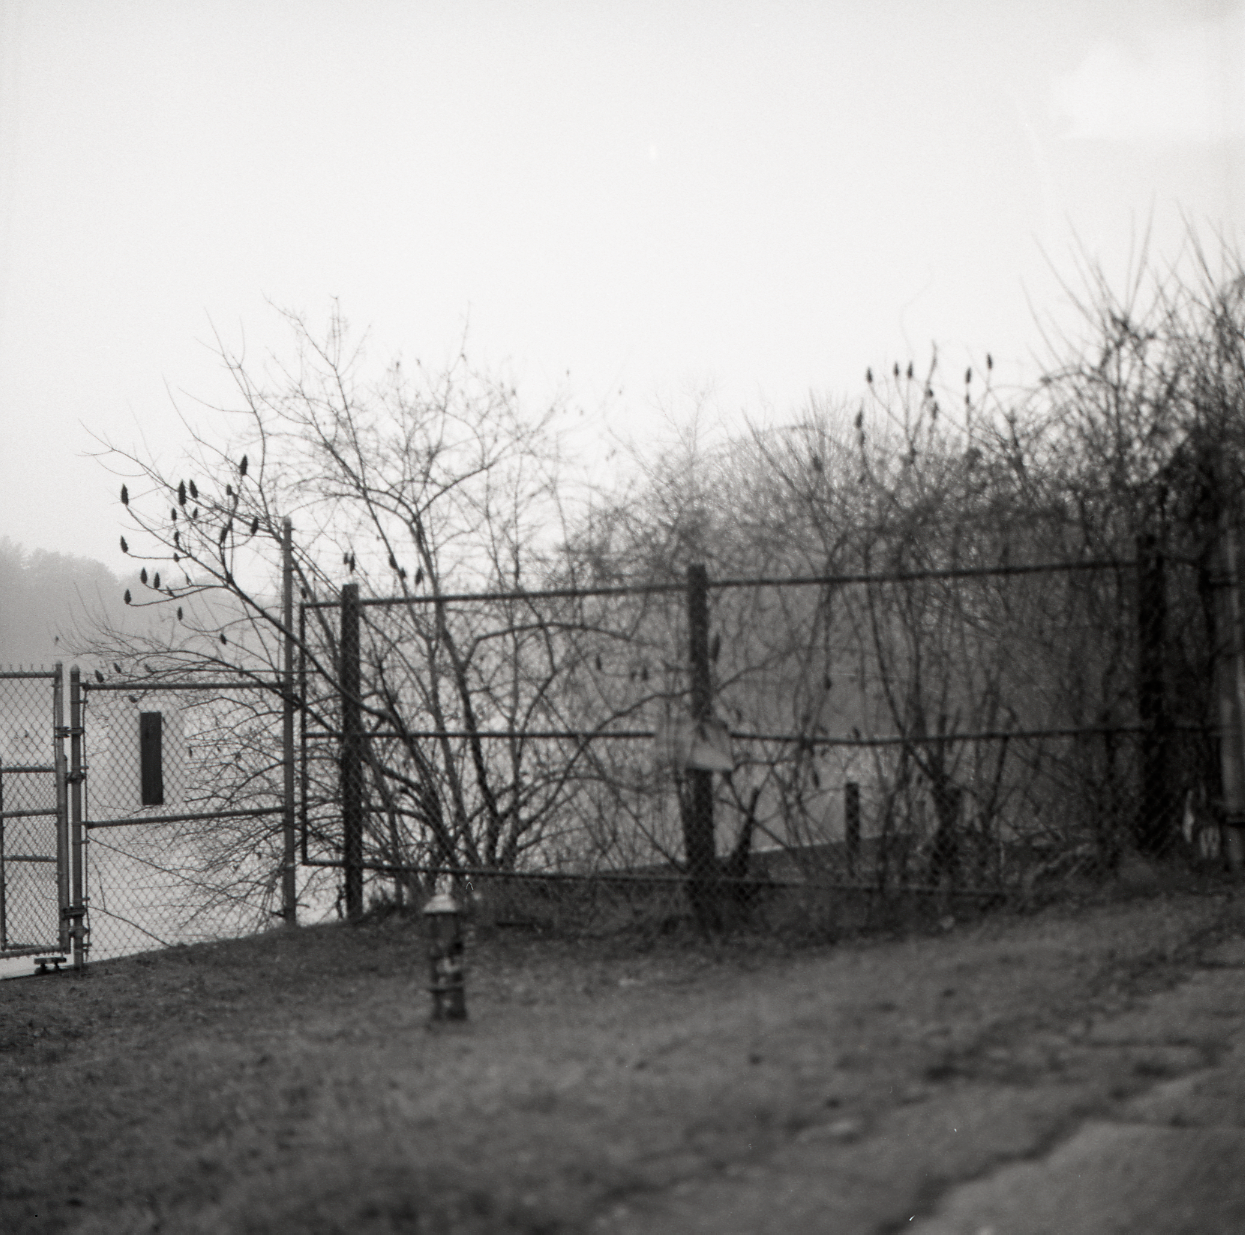 lisbon gate (1 of 3)